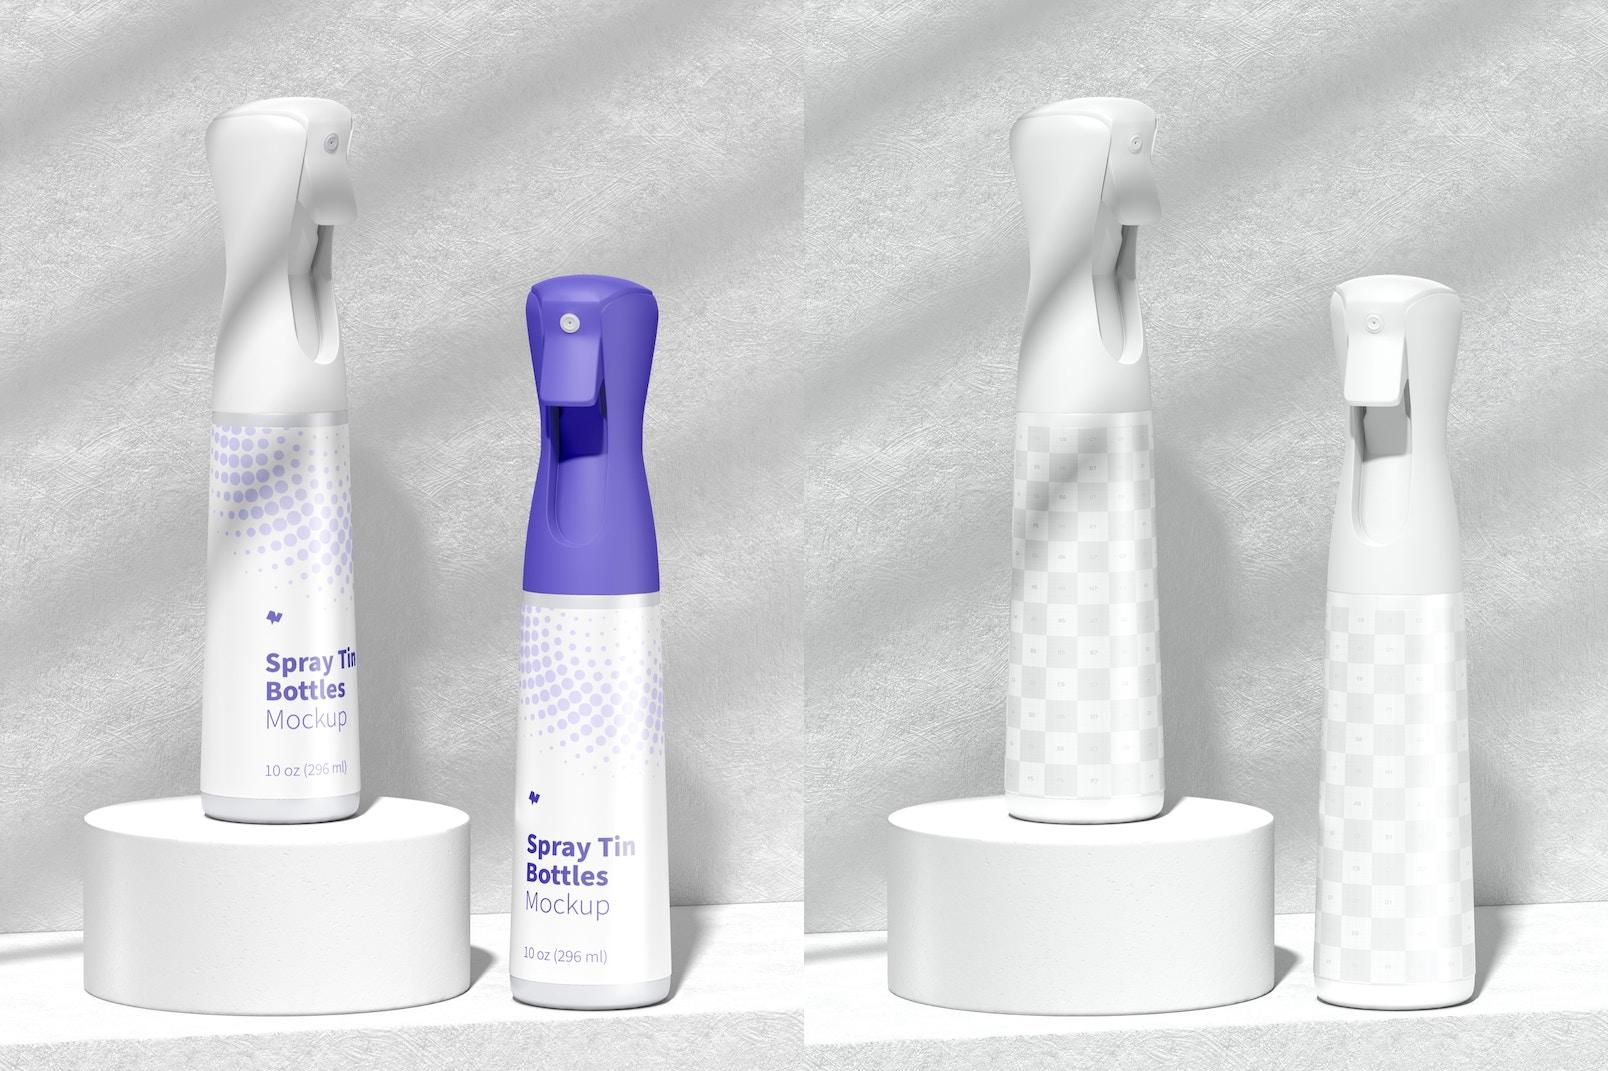 Spray Tin Bottles Mockup, Front View